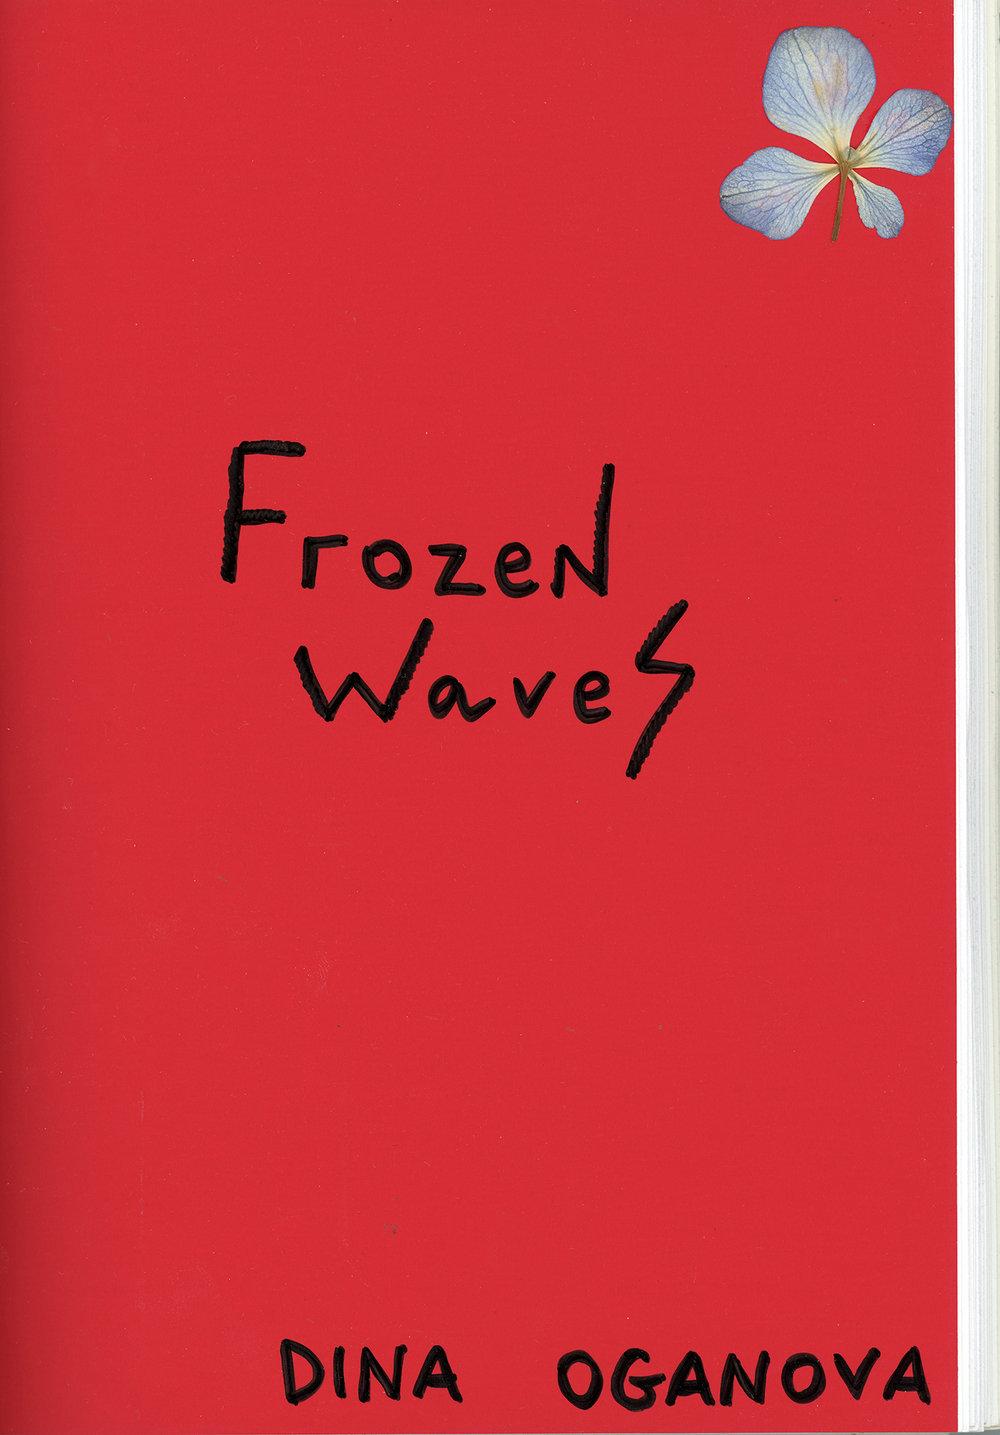 01frozen.jpg